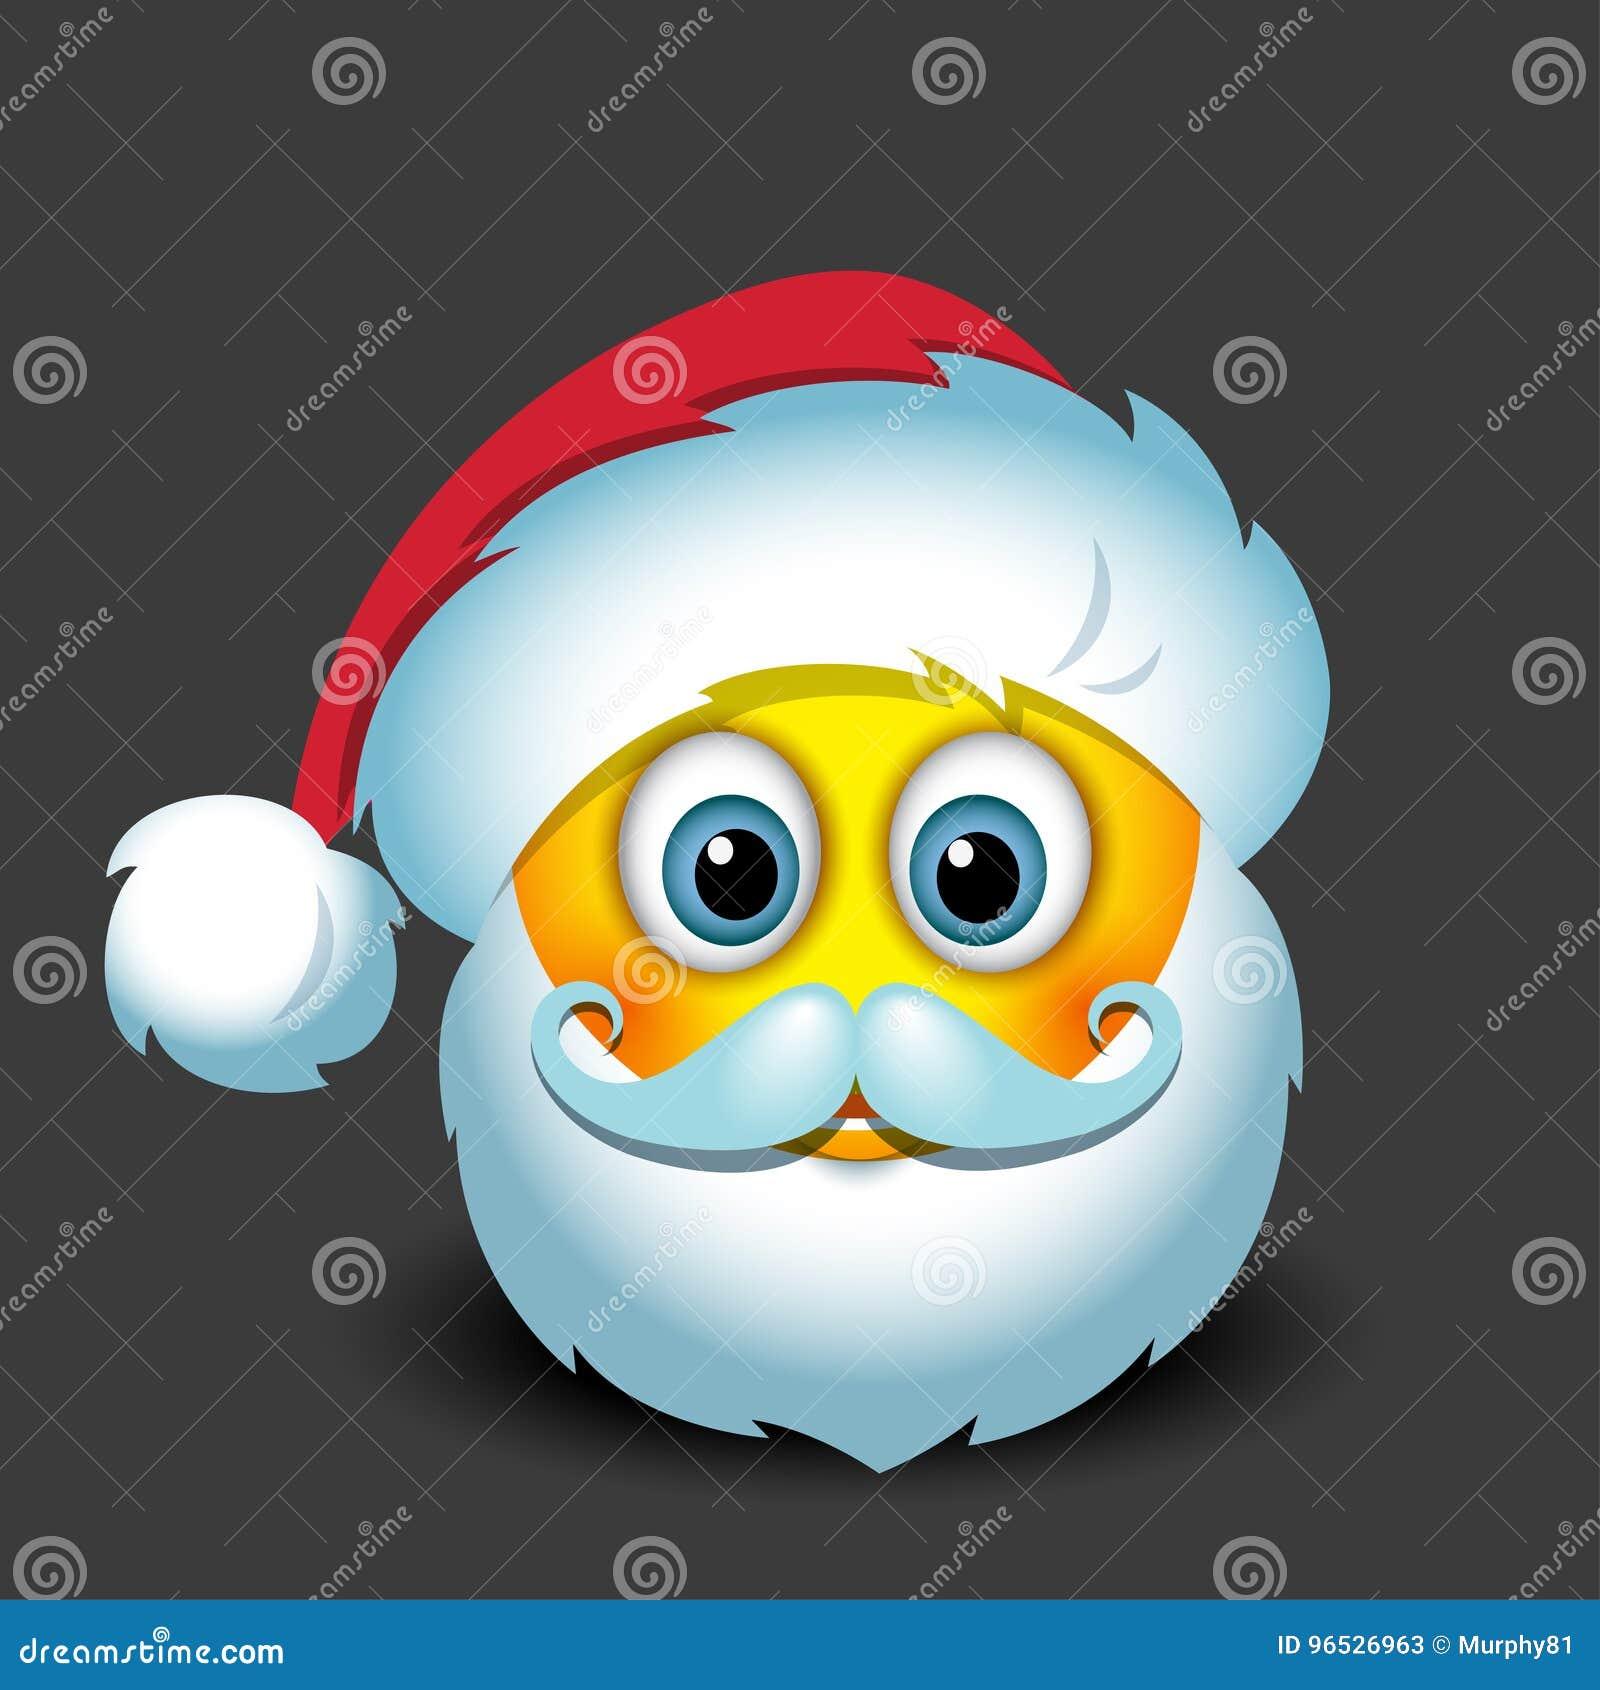 netter santa claus-emoticon, smiley, emoji - vector illustration vektor  abbildung - illustration von hintergrund, graphik: 96526963  dreamstime.com